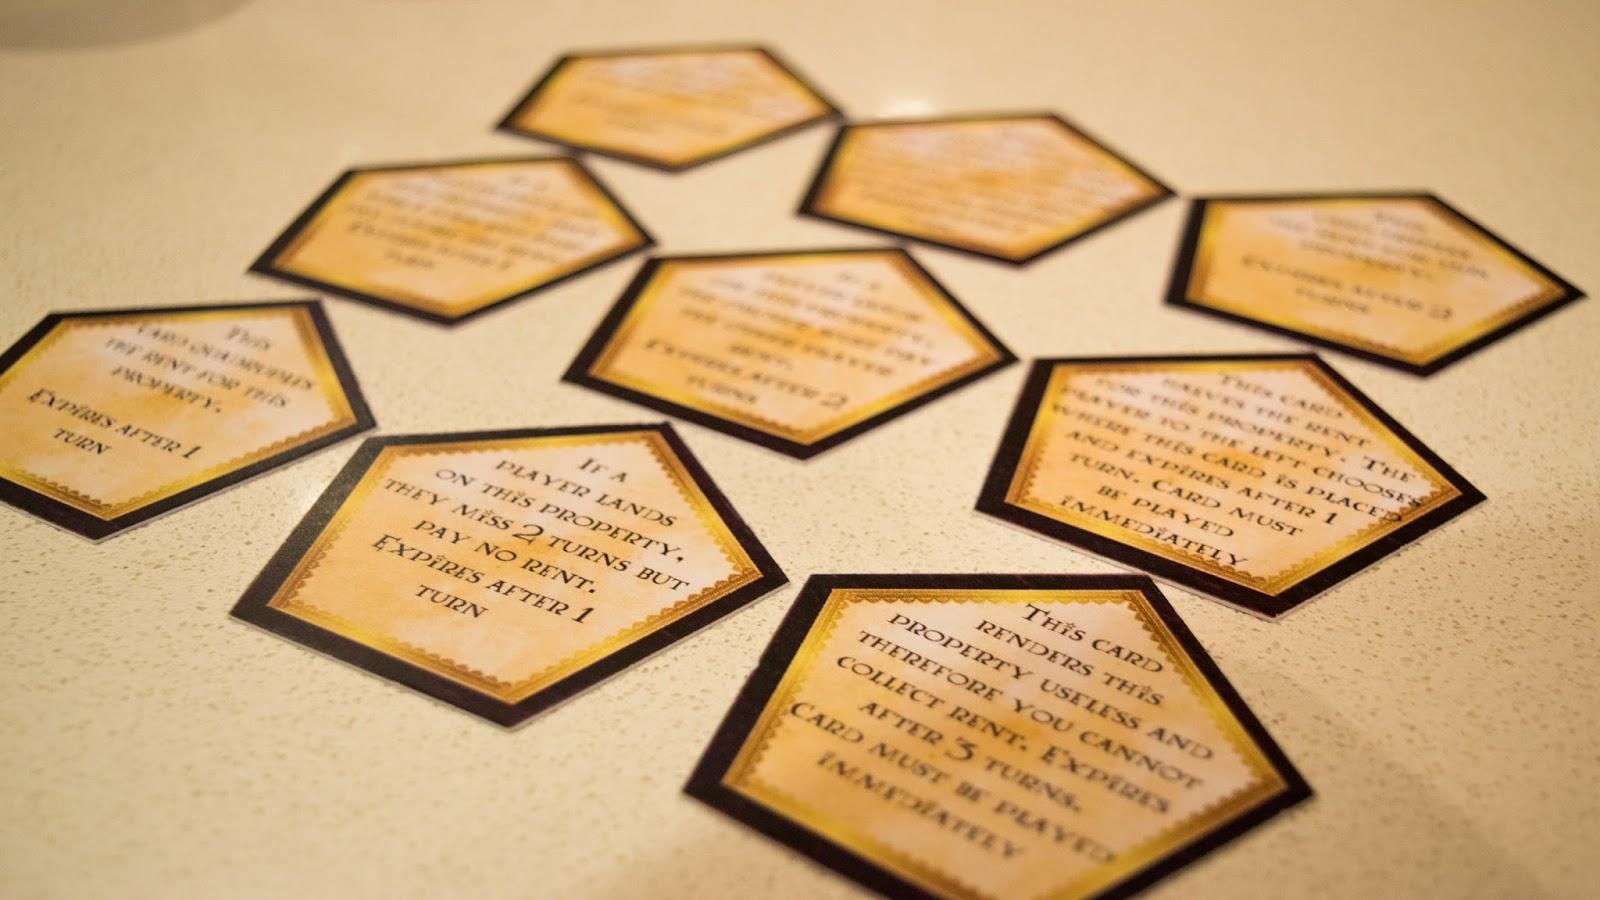 monopoly money template microsoft word - Hizir kaptanband co